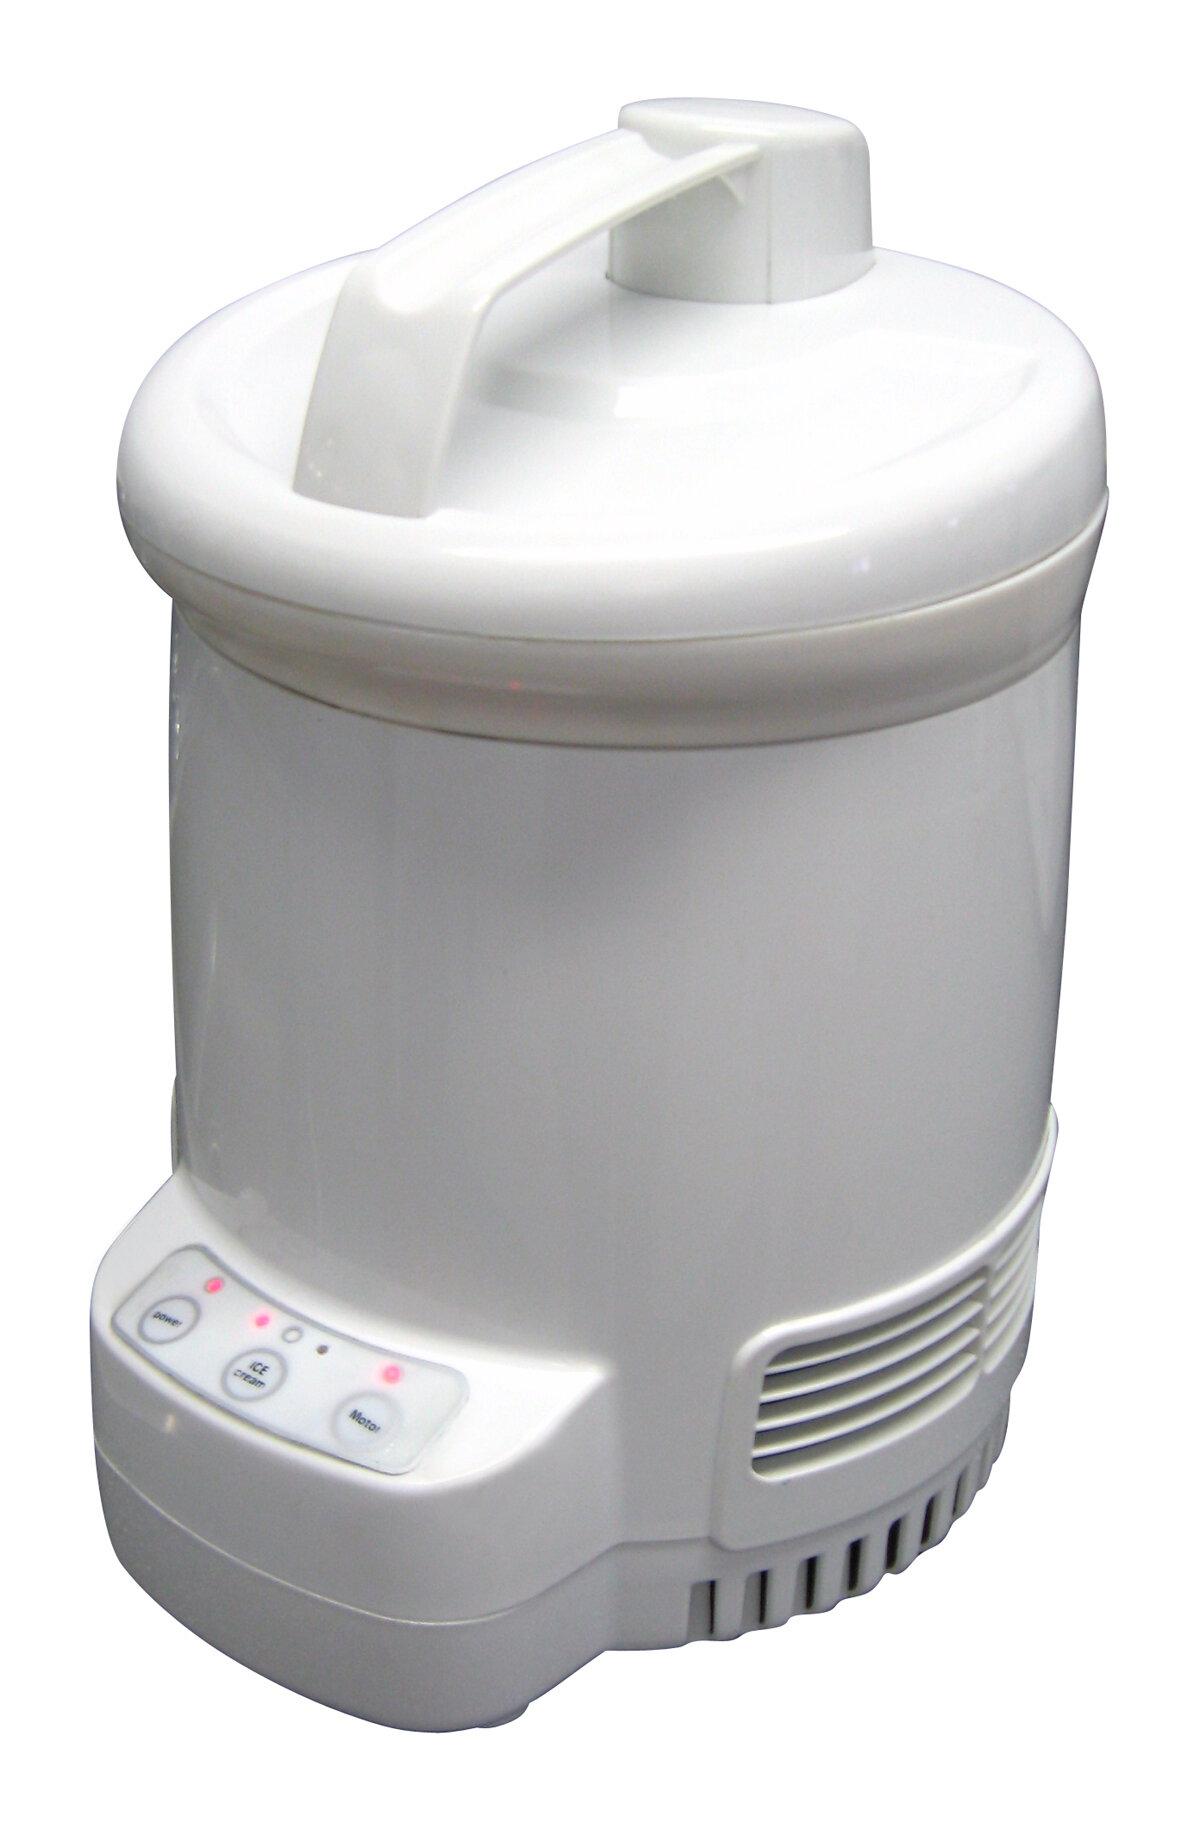 koolatron total chef ice cream maker wayfair rh wayfair com Yogurt Maker Machine Euro Cuisine Yogurt Maker